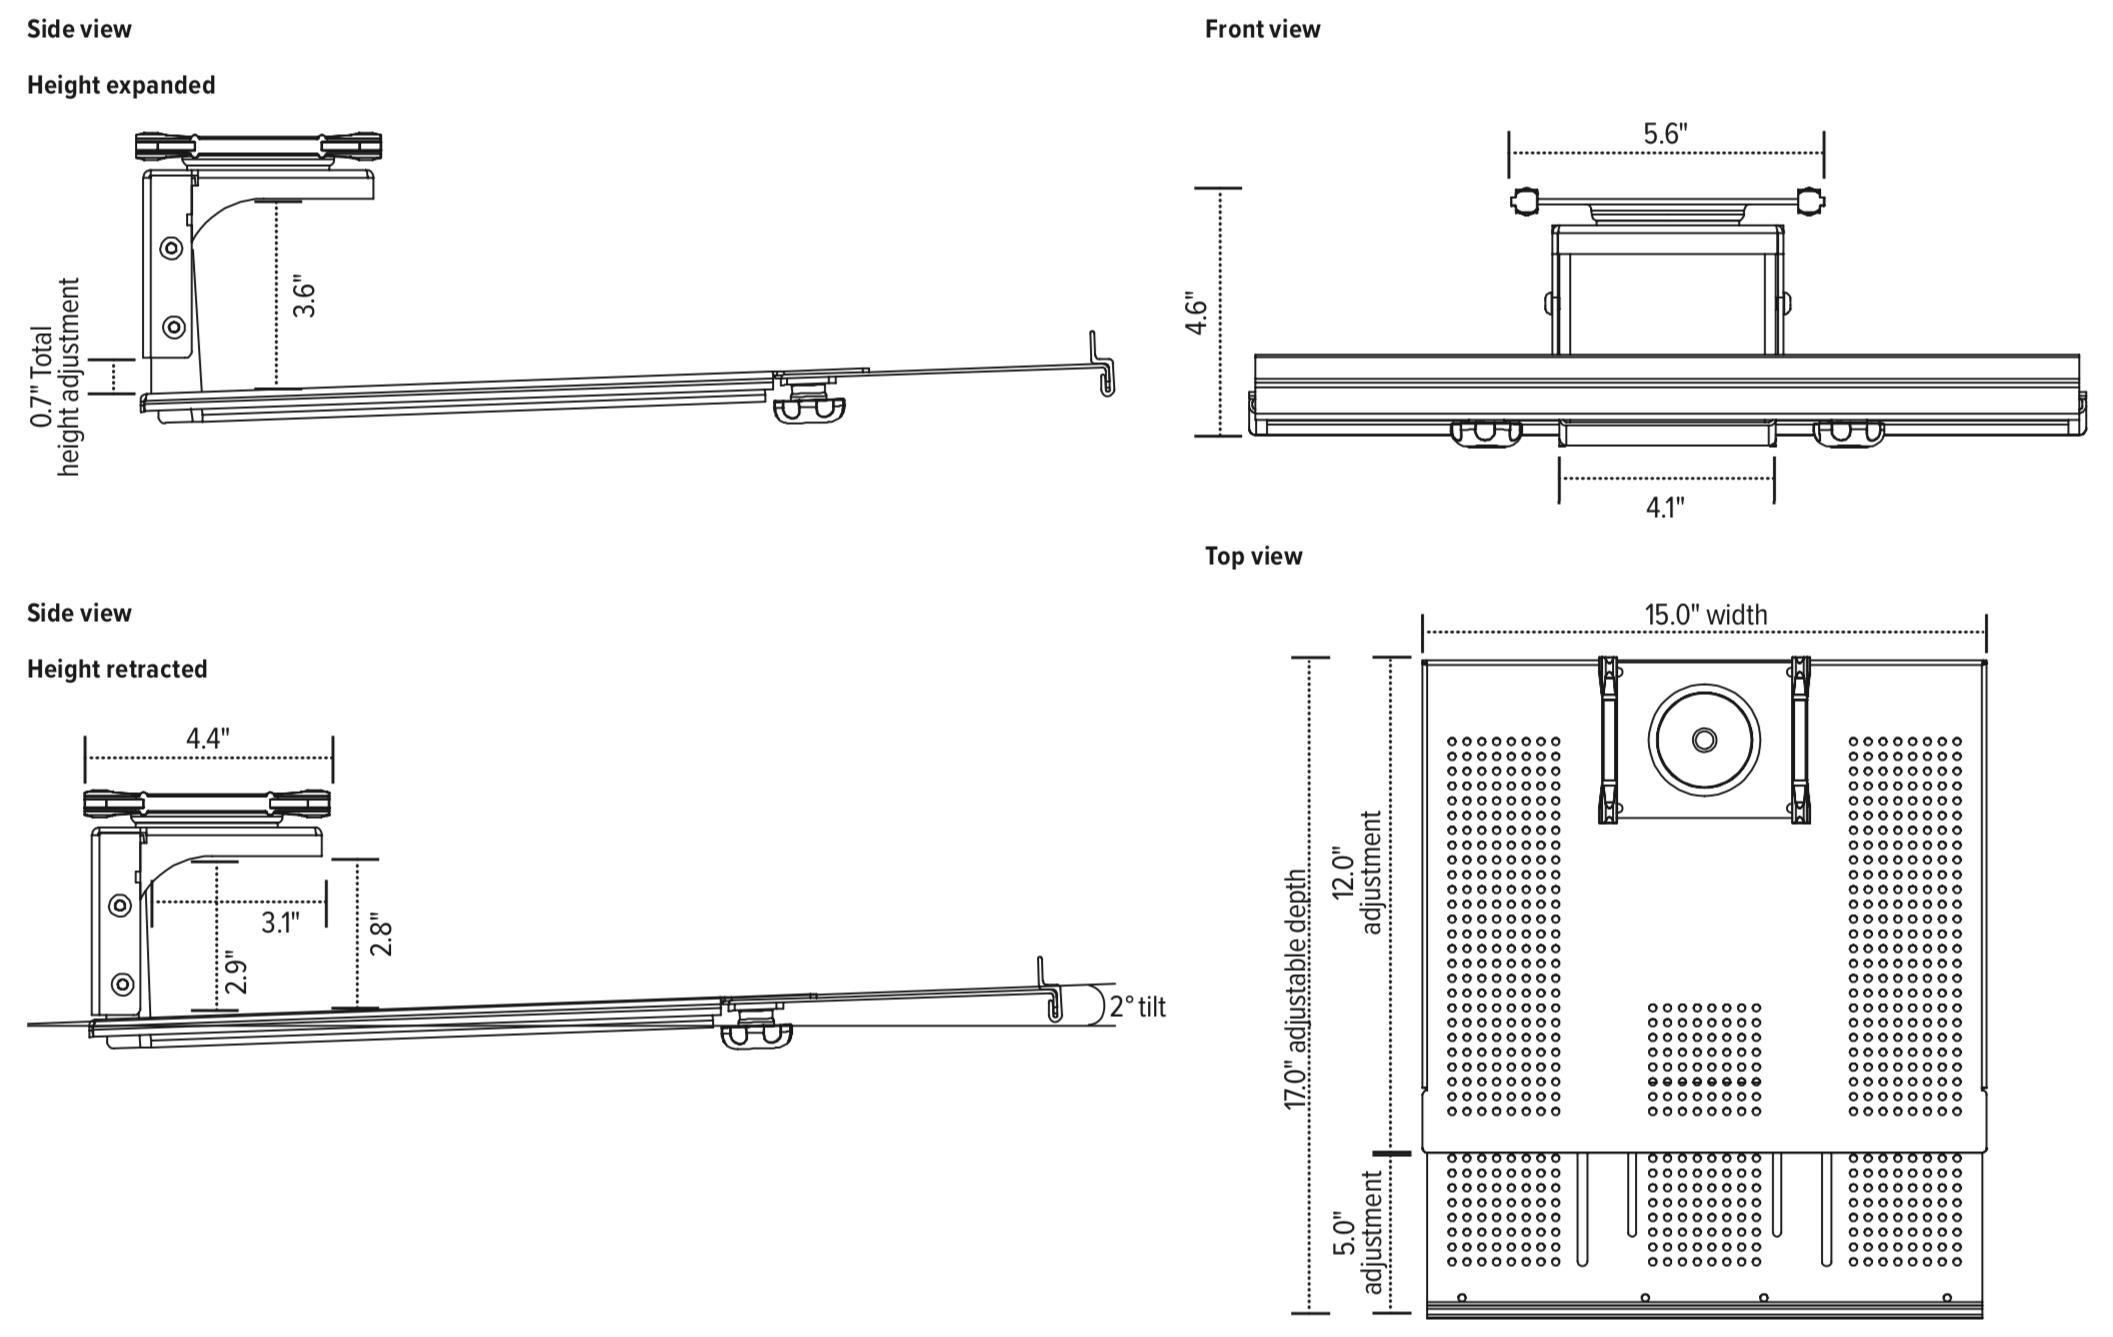 iMovR Tech Dock Dimensions